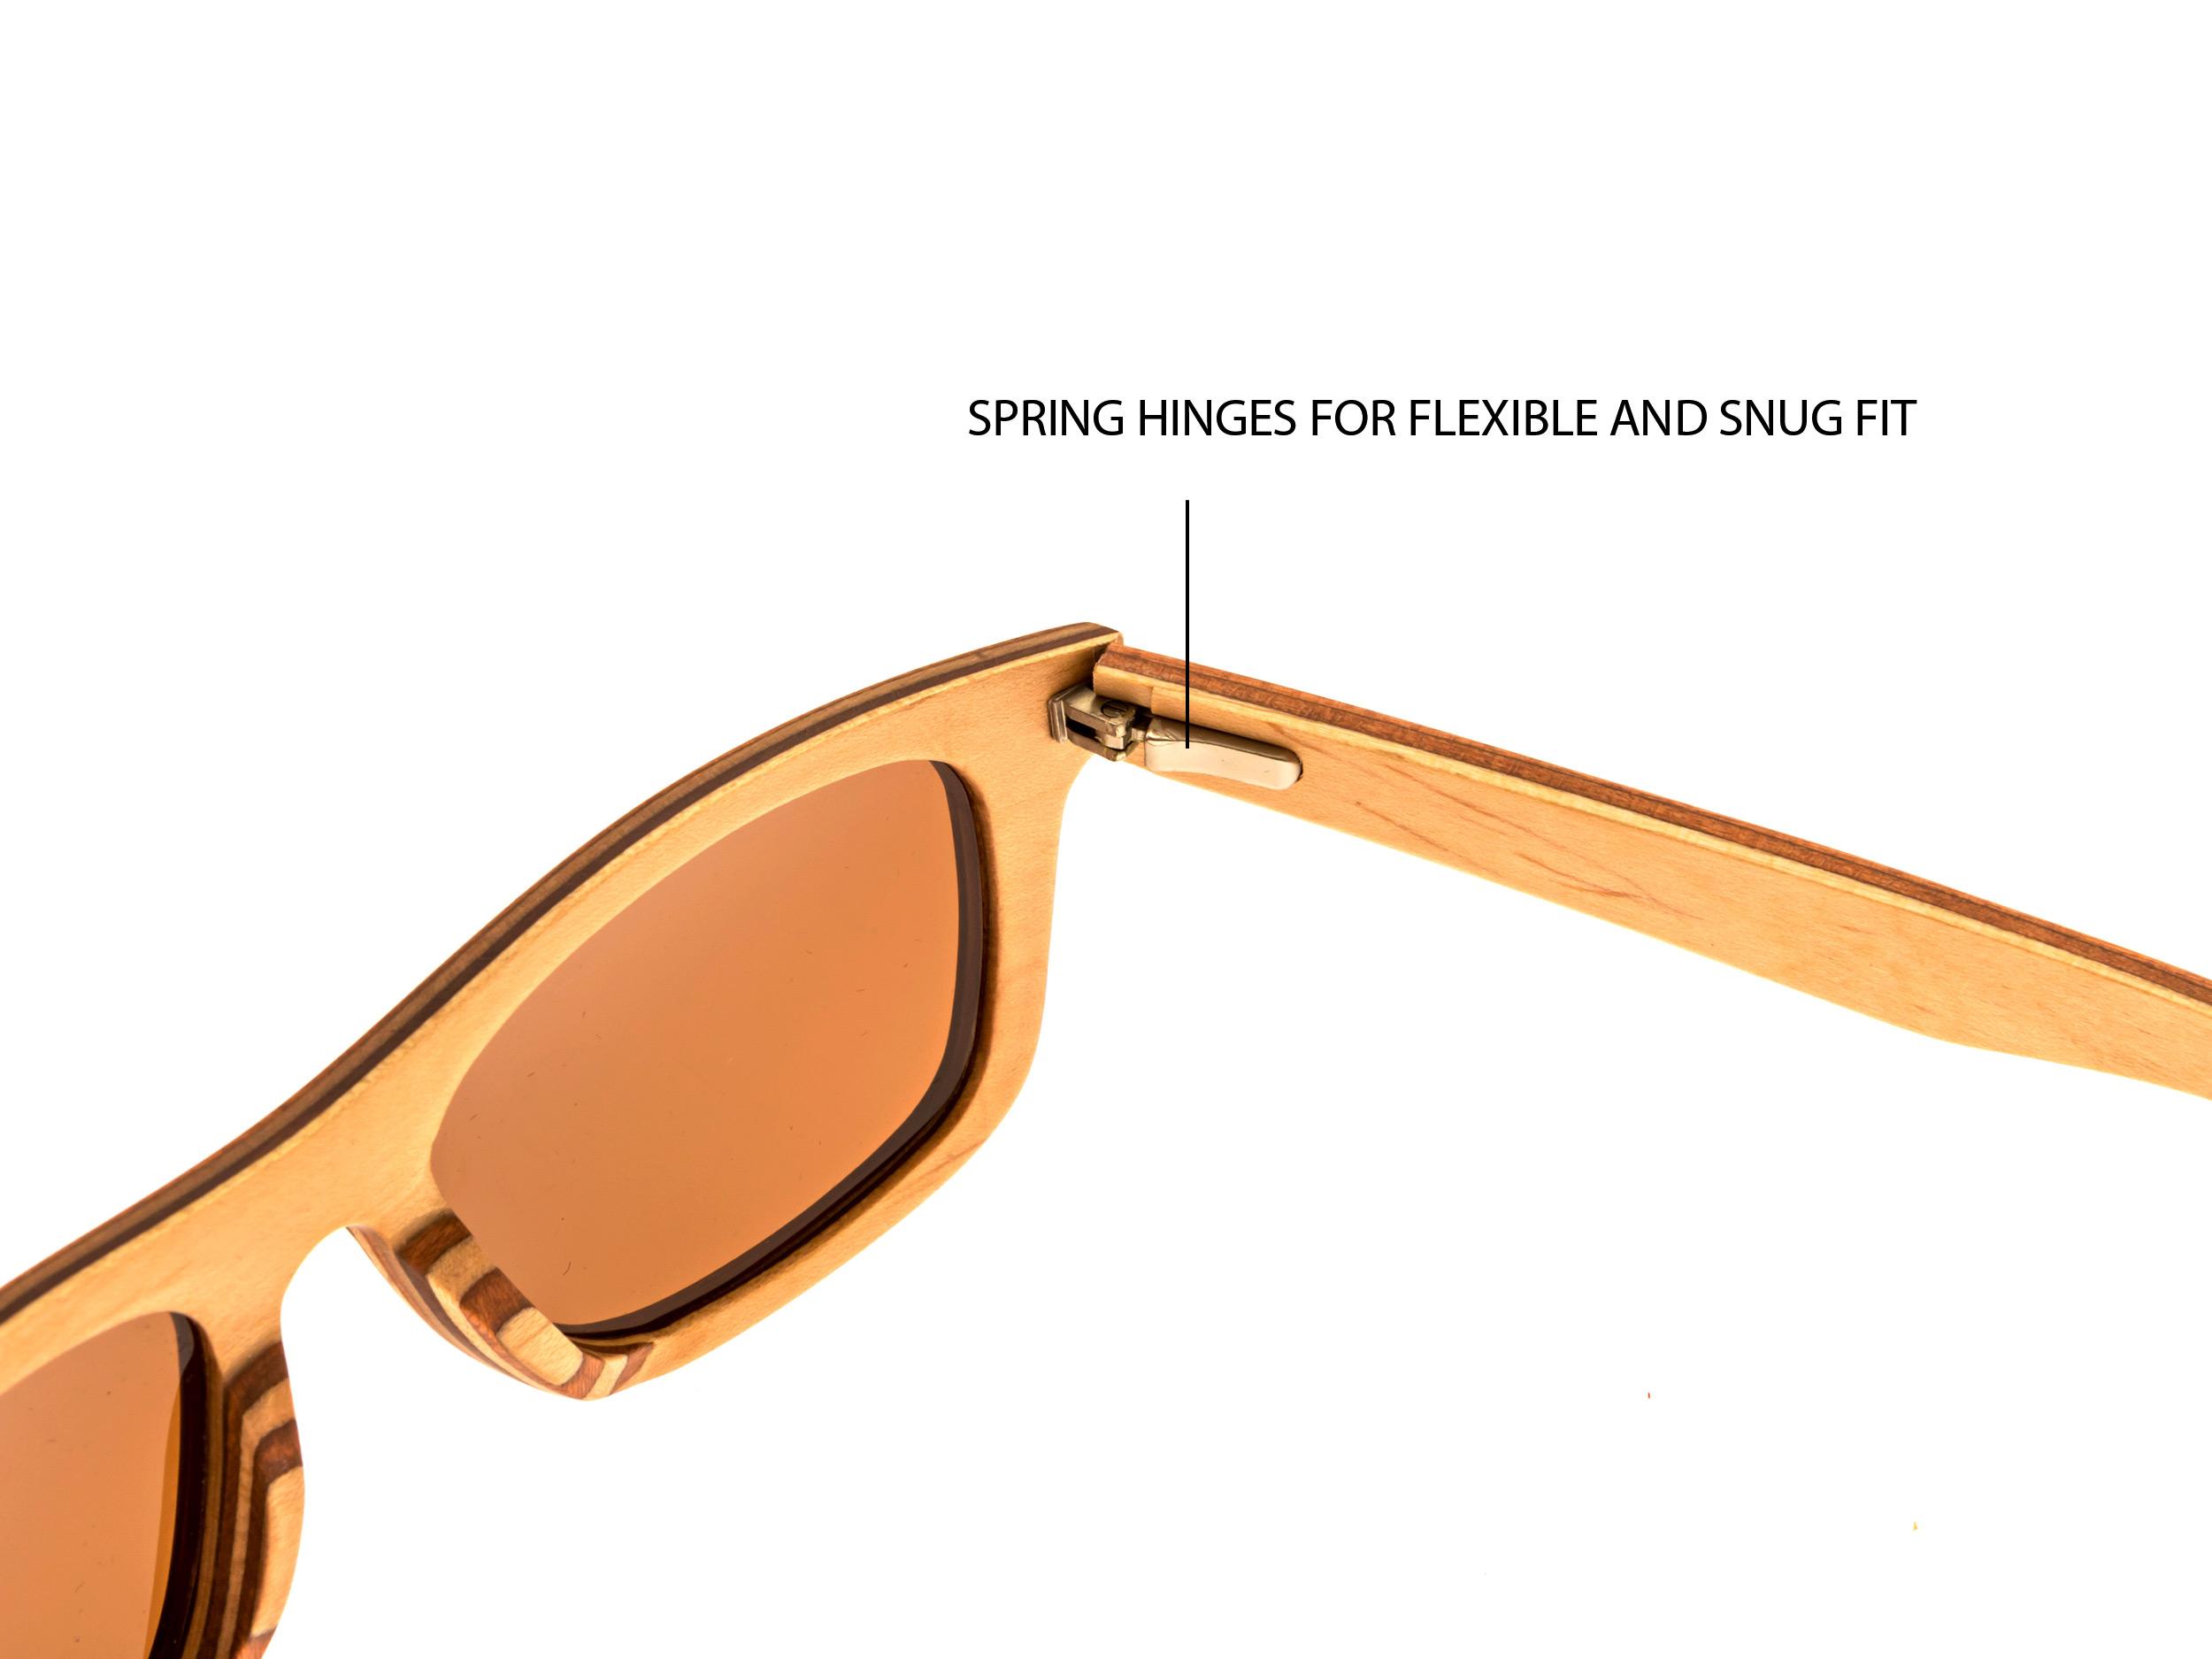 Skateboard wood sunglasses Toulouse hinge